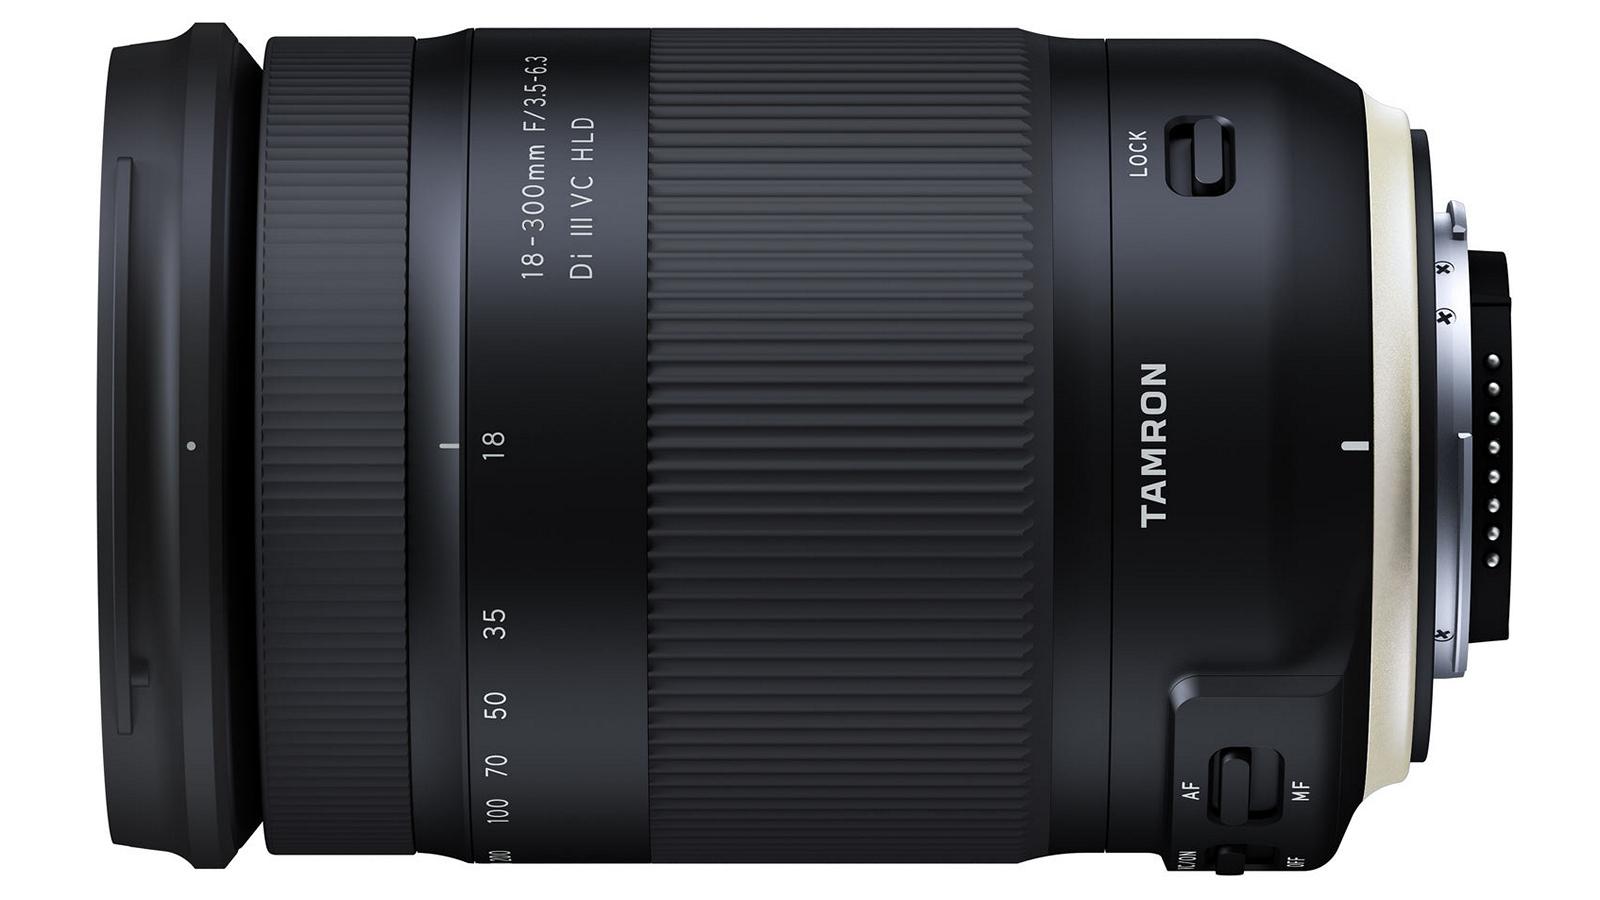 Возможный внешний вид объектива Tamron 18-300mm f/3.5-6.3 Di III-A VC VXD